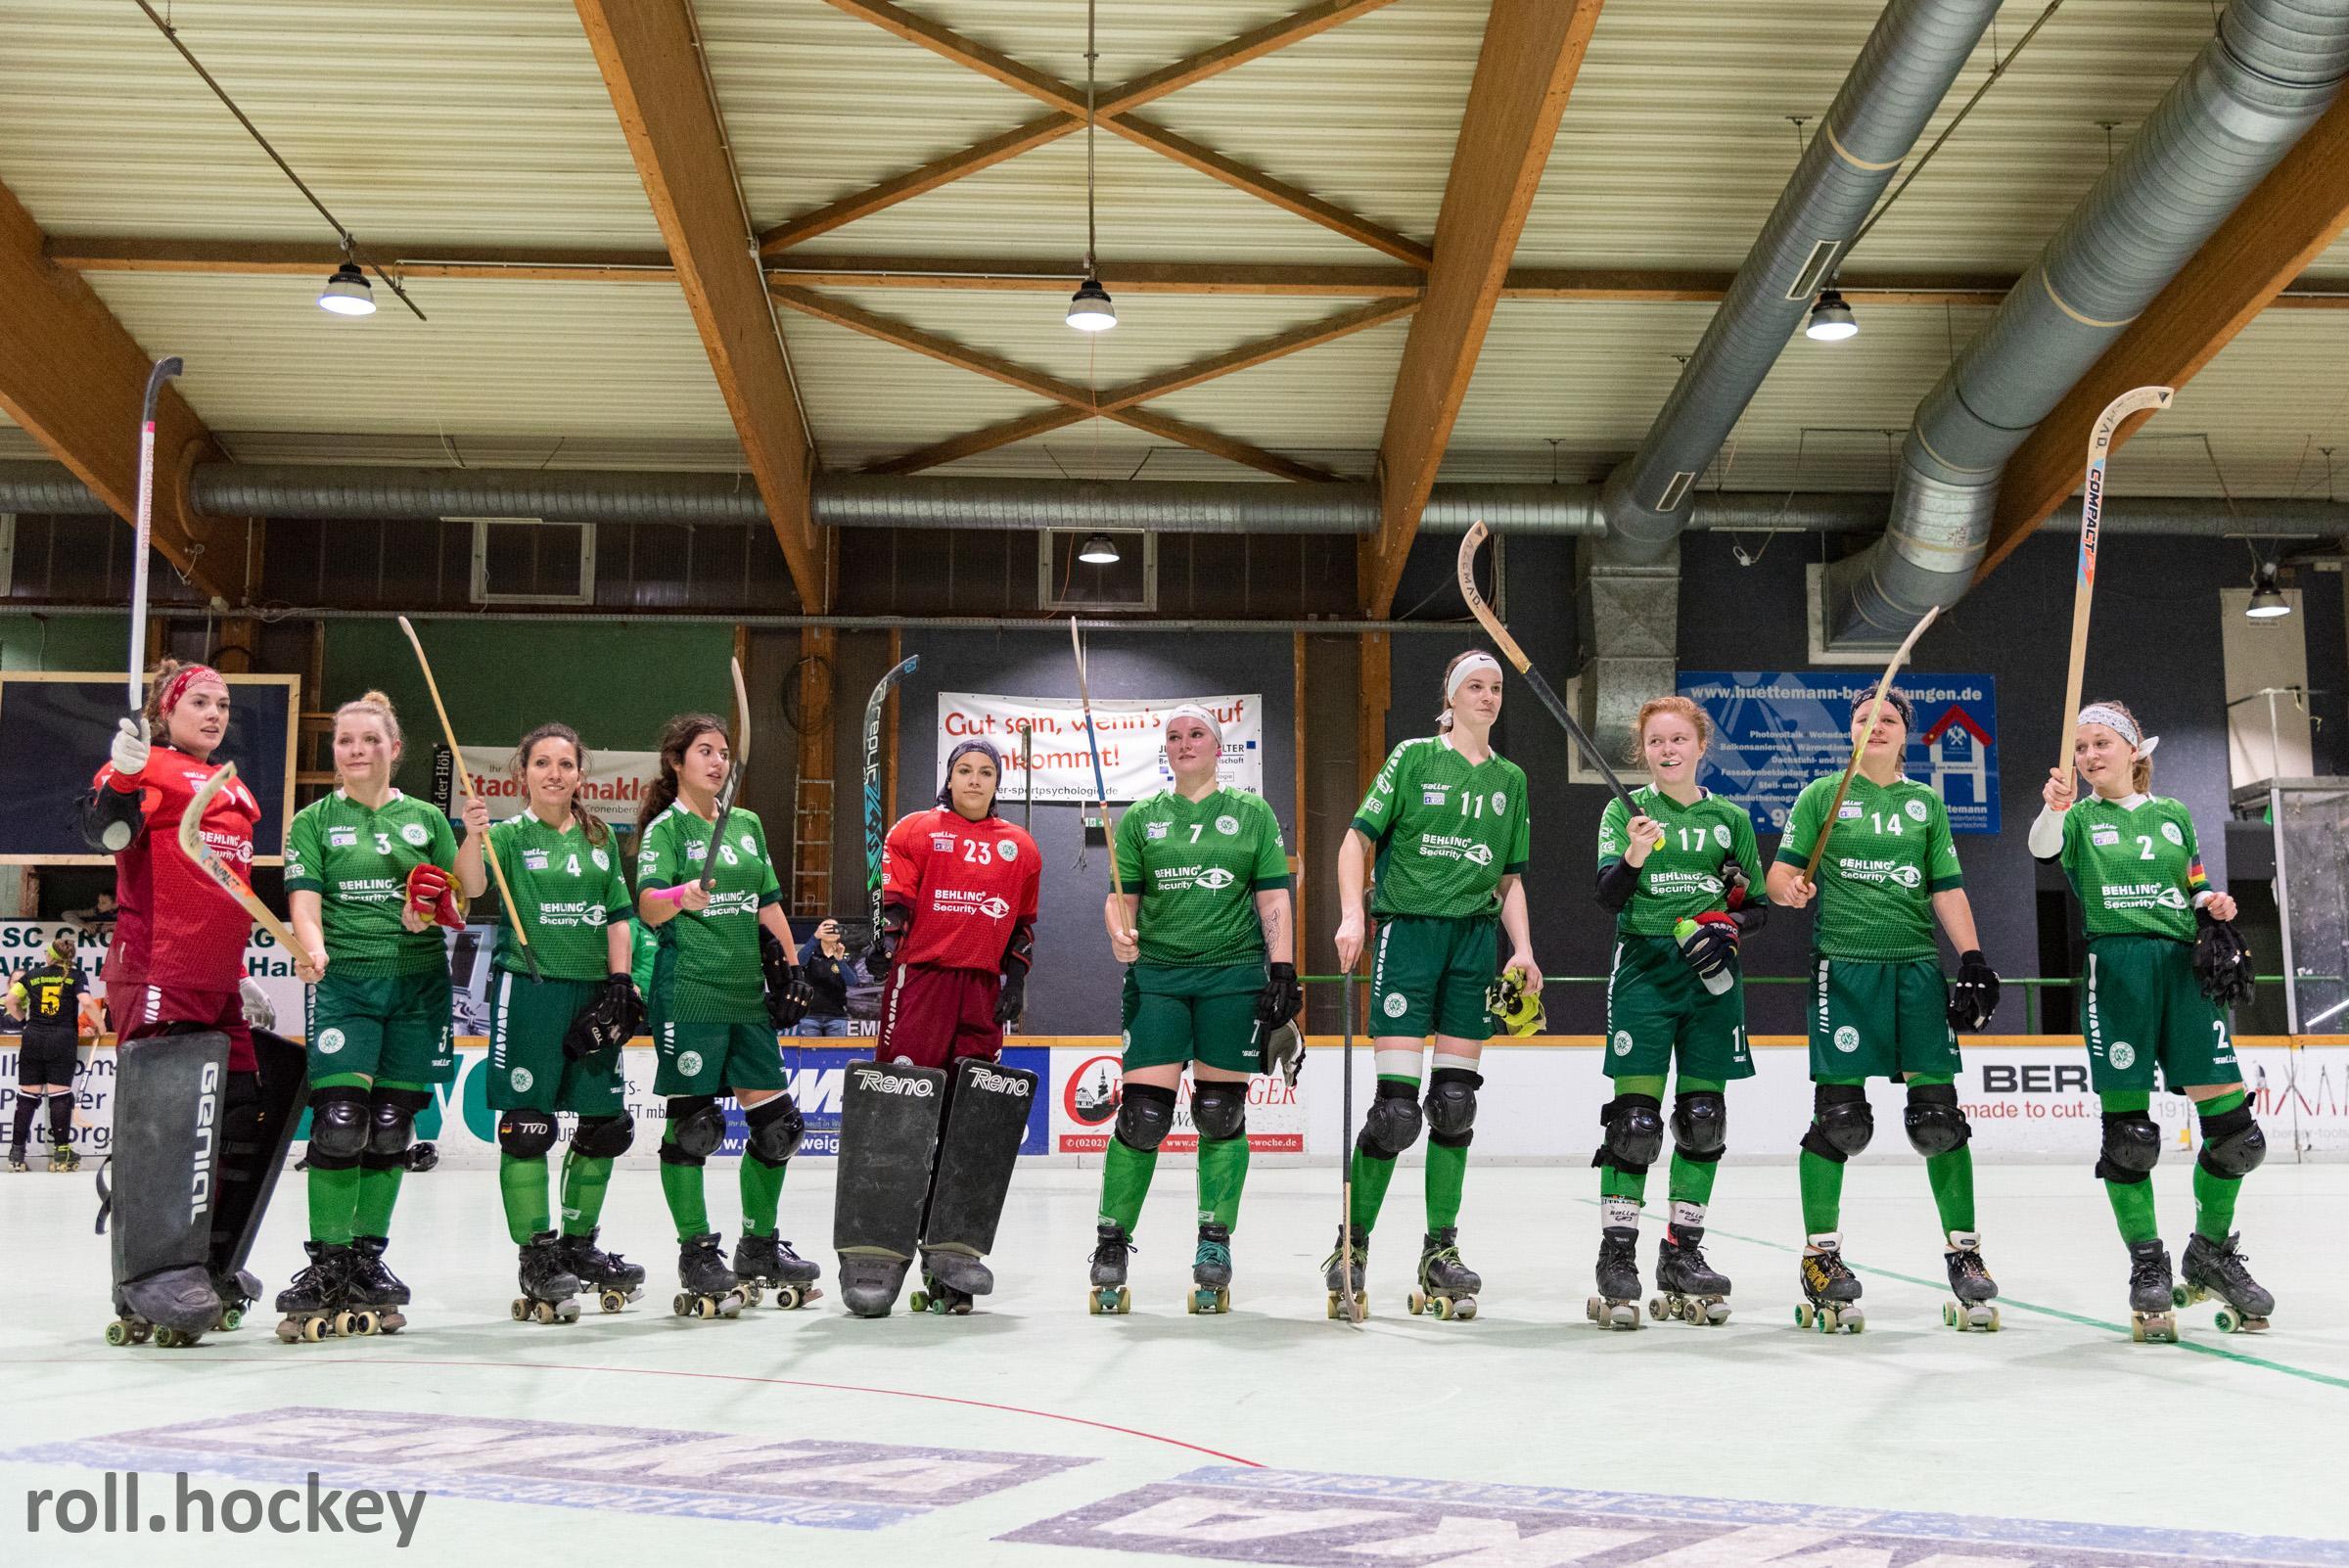 RSC Cronenberg Rollhockey Bundesliga Damen Spieltag 07.12.2019